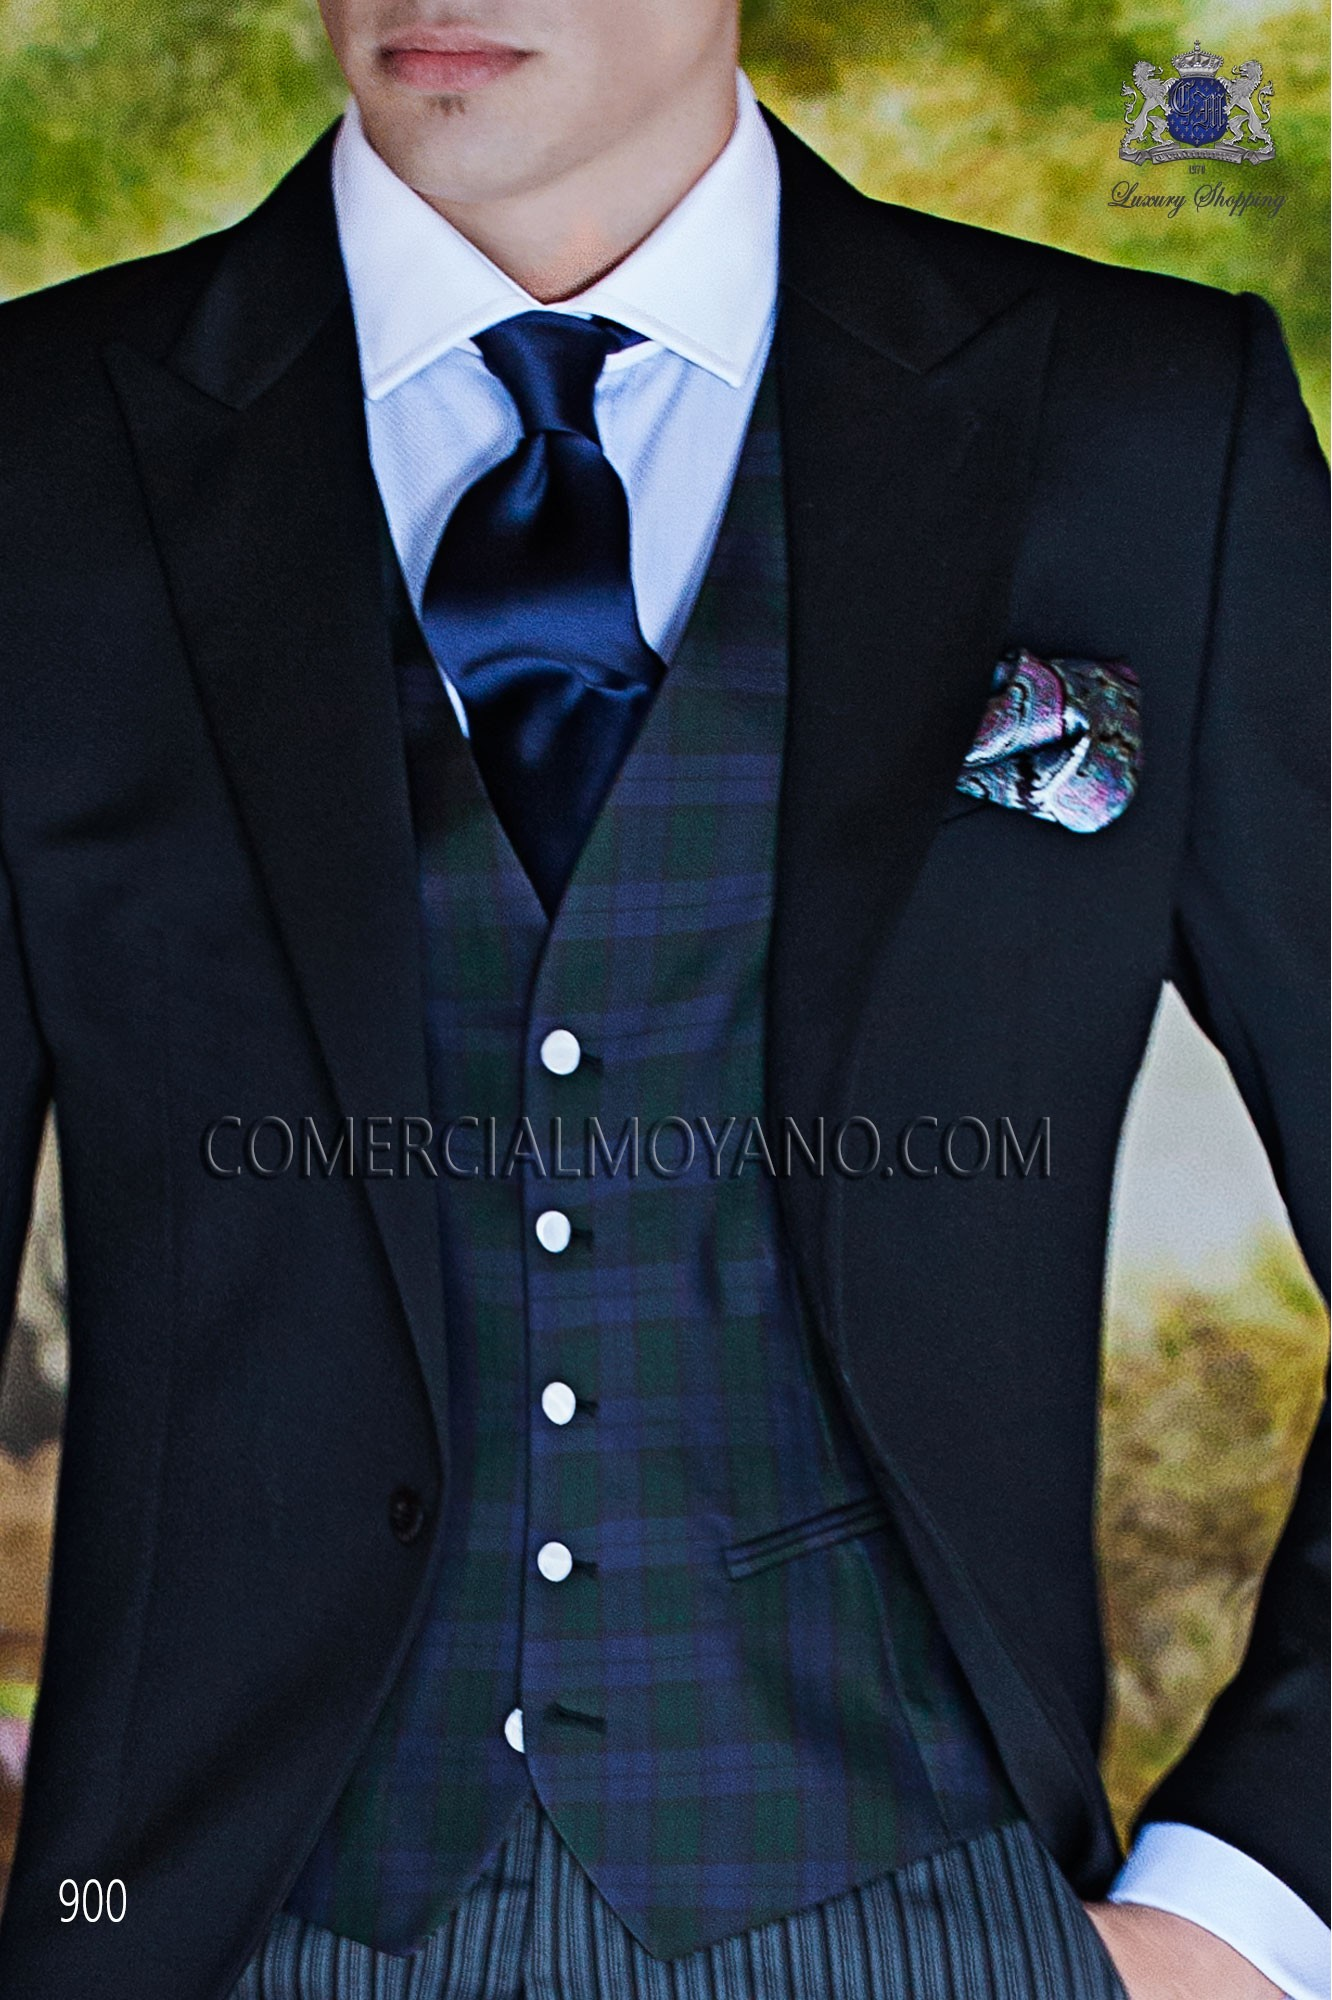 Italian gentleman black men wedding suit, model: 900 Ottavio Nuccio Gala Gentleman Collection